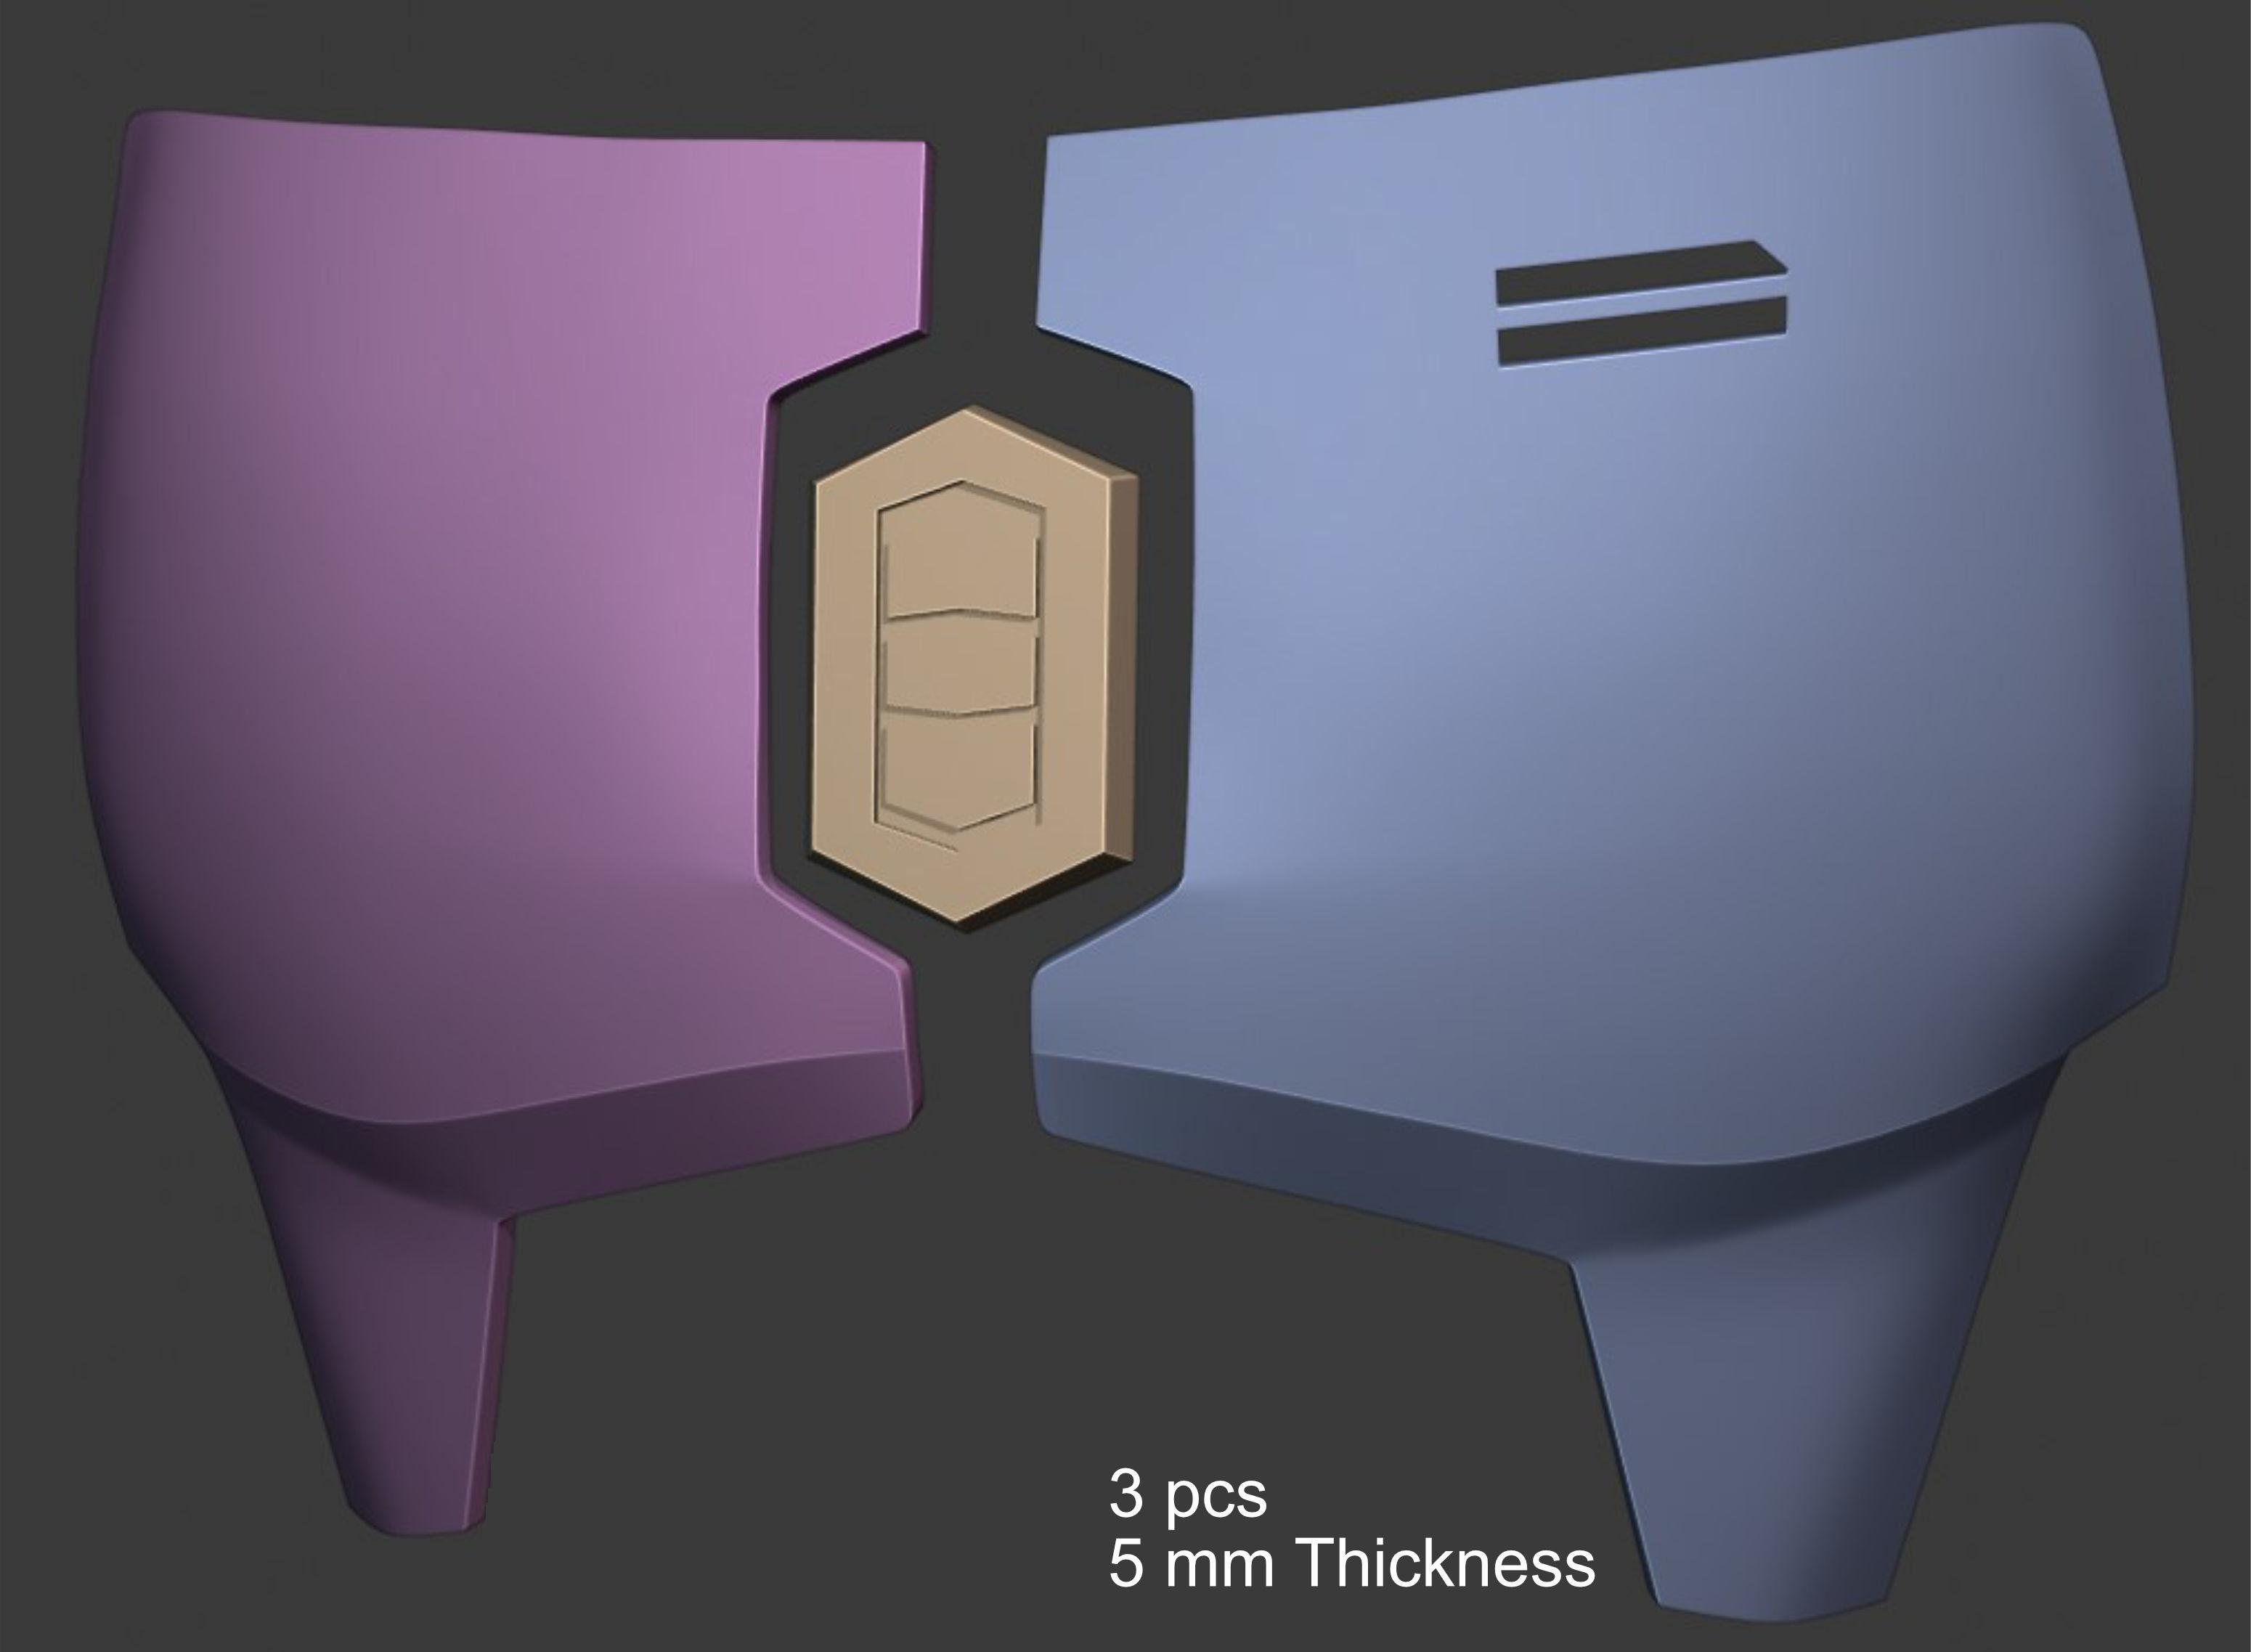 Mandalorian Chest Armor Plates with Center Diamond